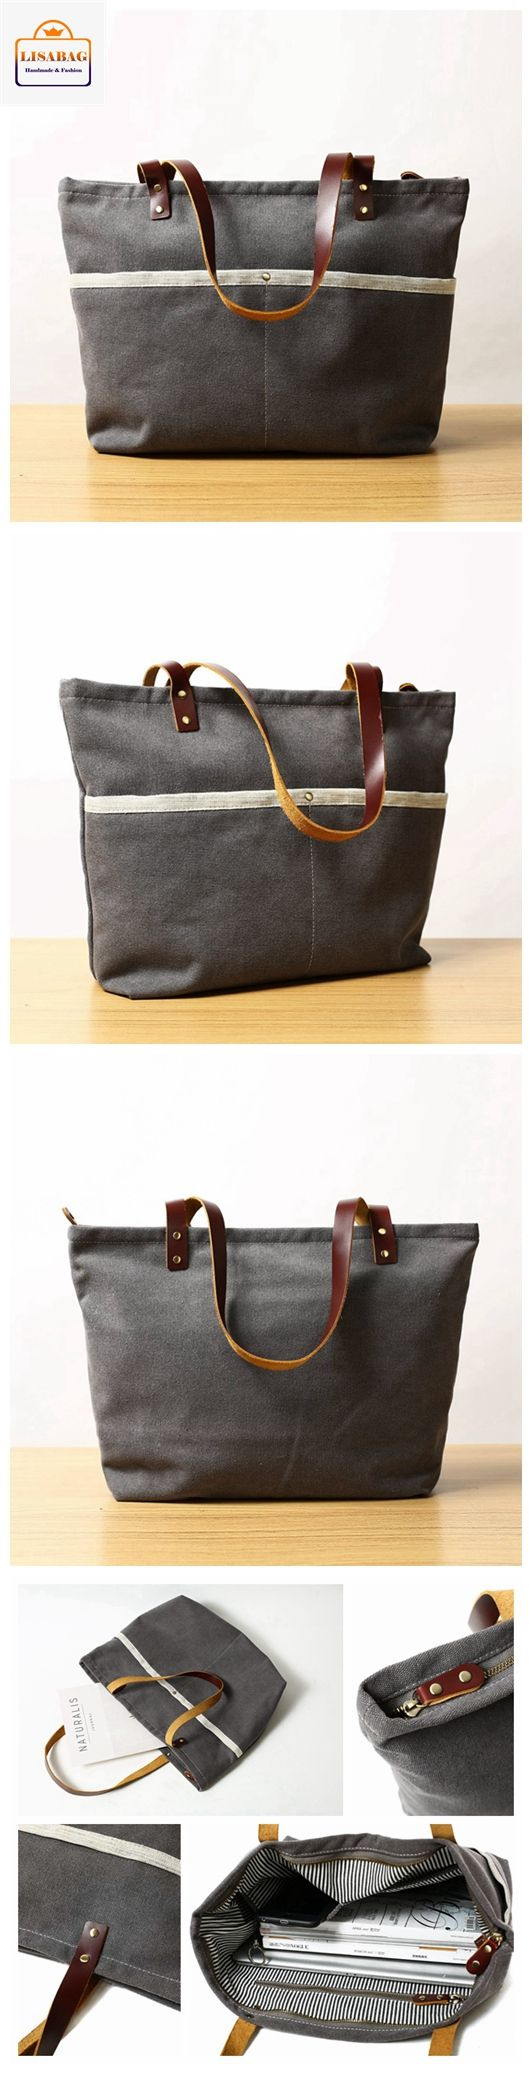 Handcrafted Grey Canvas Tote Bag Shopper Bag Diaper Bag Shoulder Bag Handbag 14022